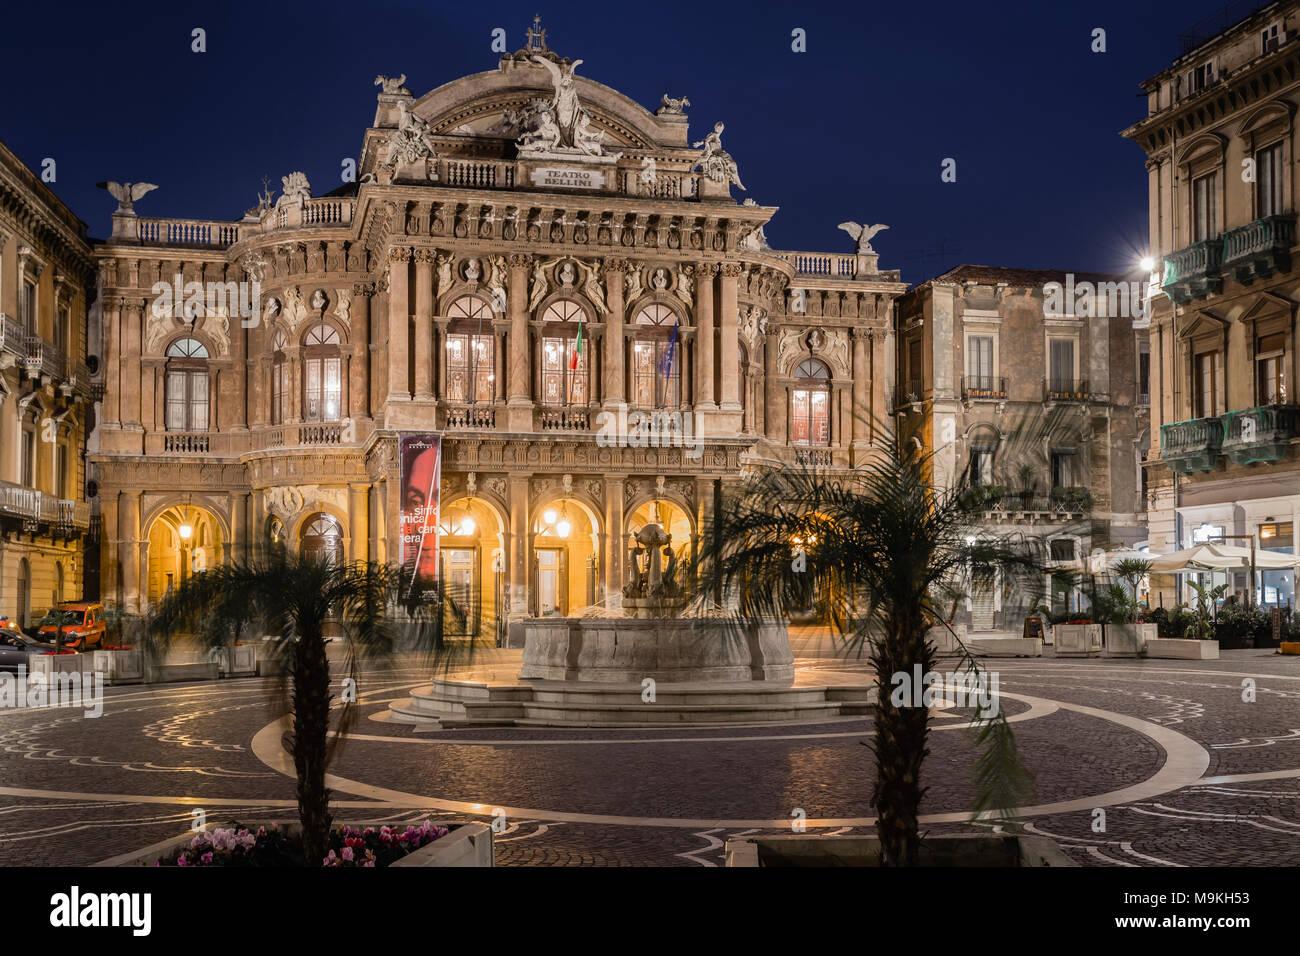 Teatro Bellini en Catania, Sicilia, Italia. Imagen De Stock